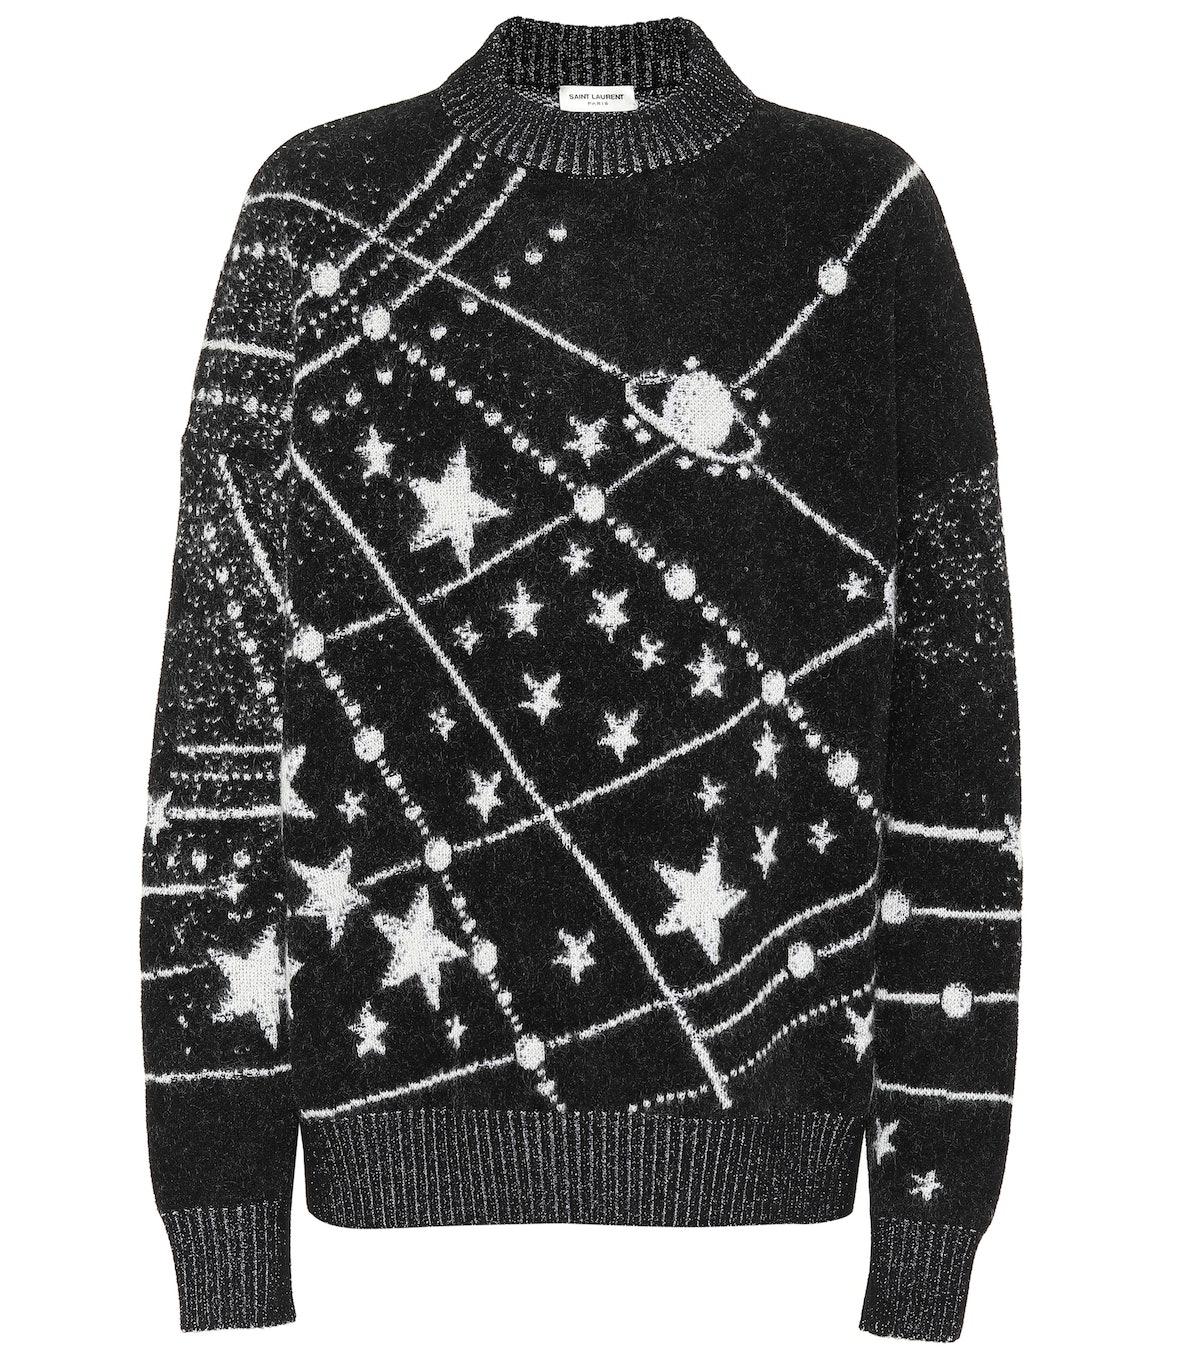 Constellation Jacquard Sweater